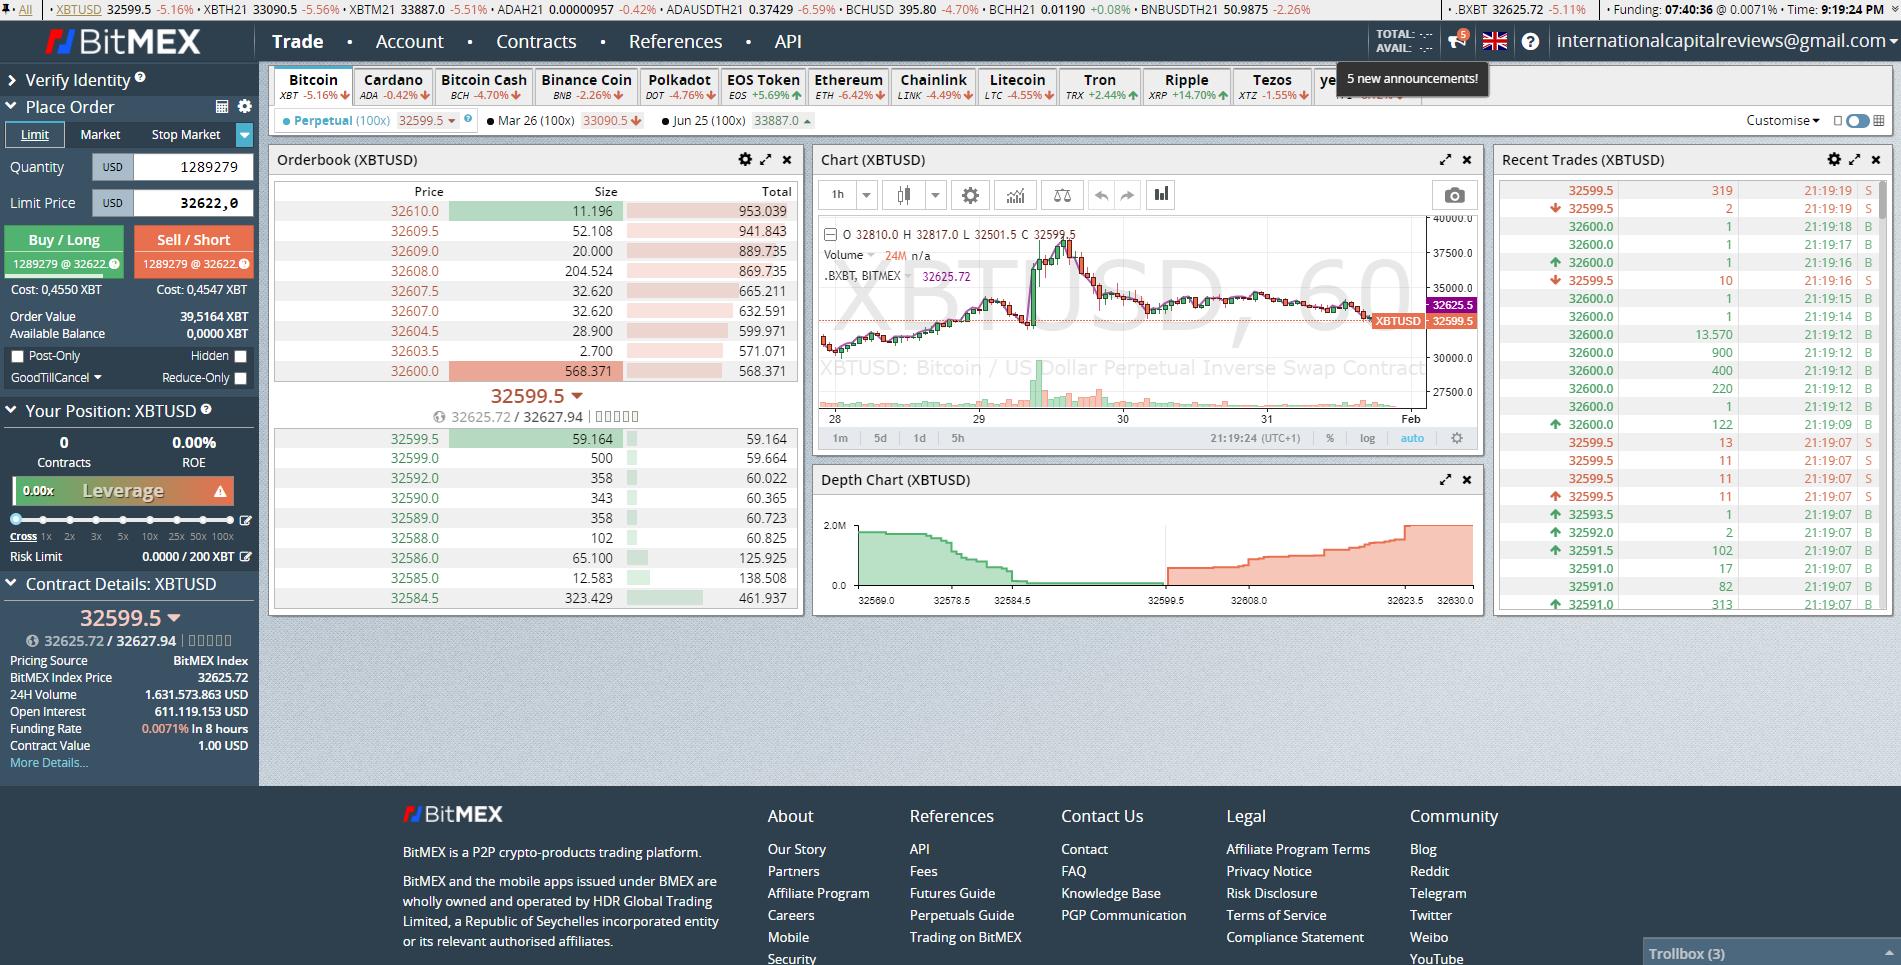 BitMEX trading platform